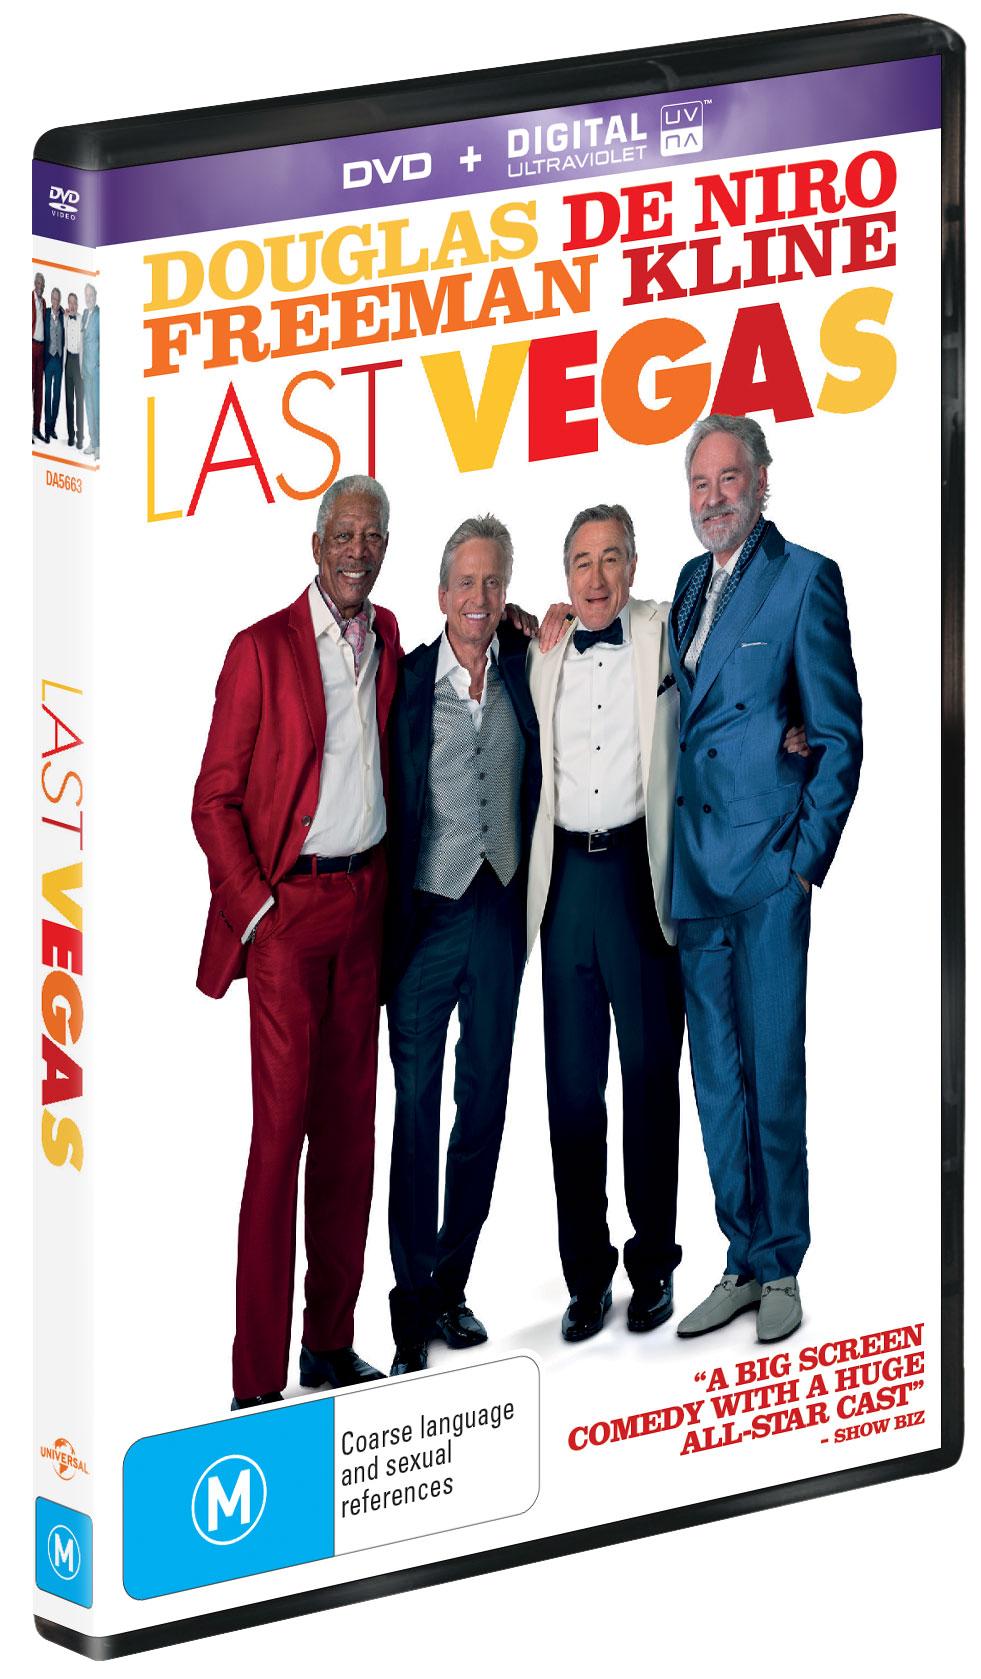 Last Vegas Dvd: Awesome Last Vegas Released On DVD!